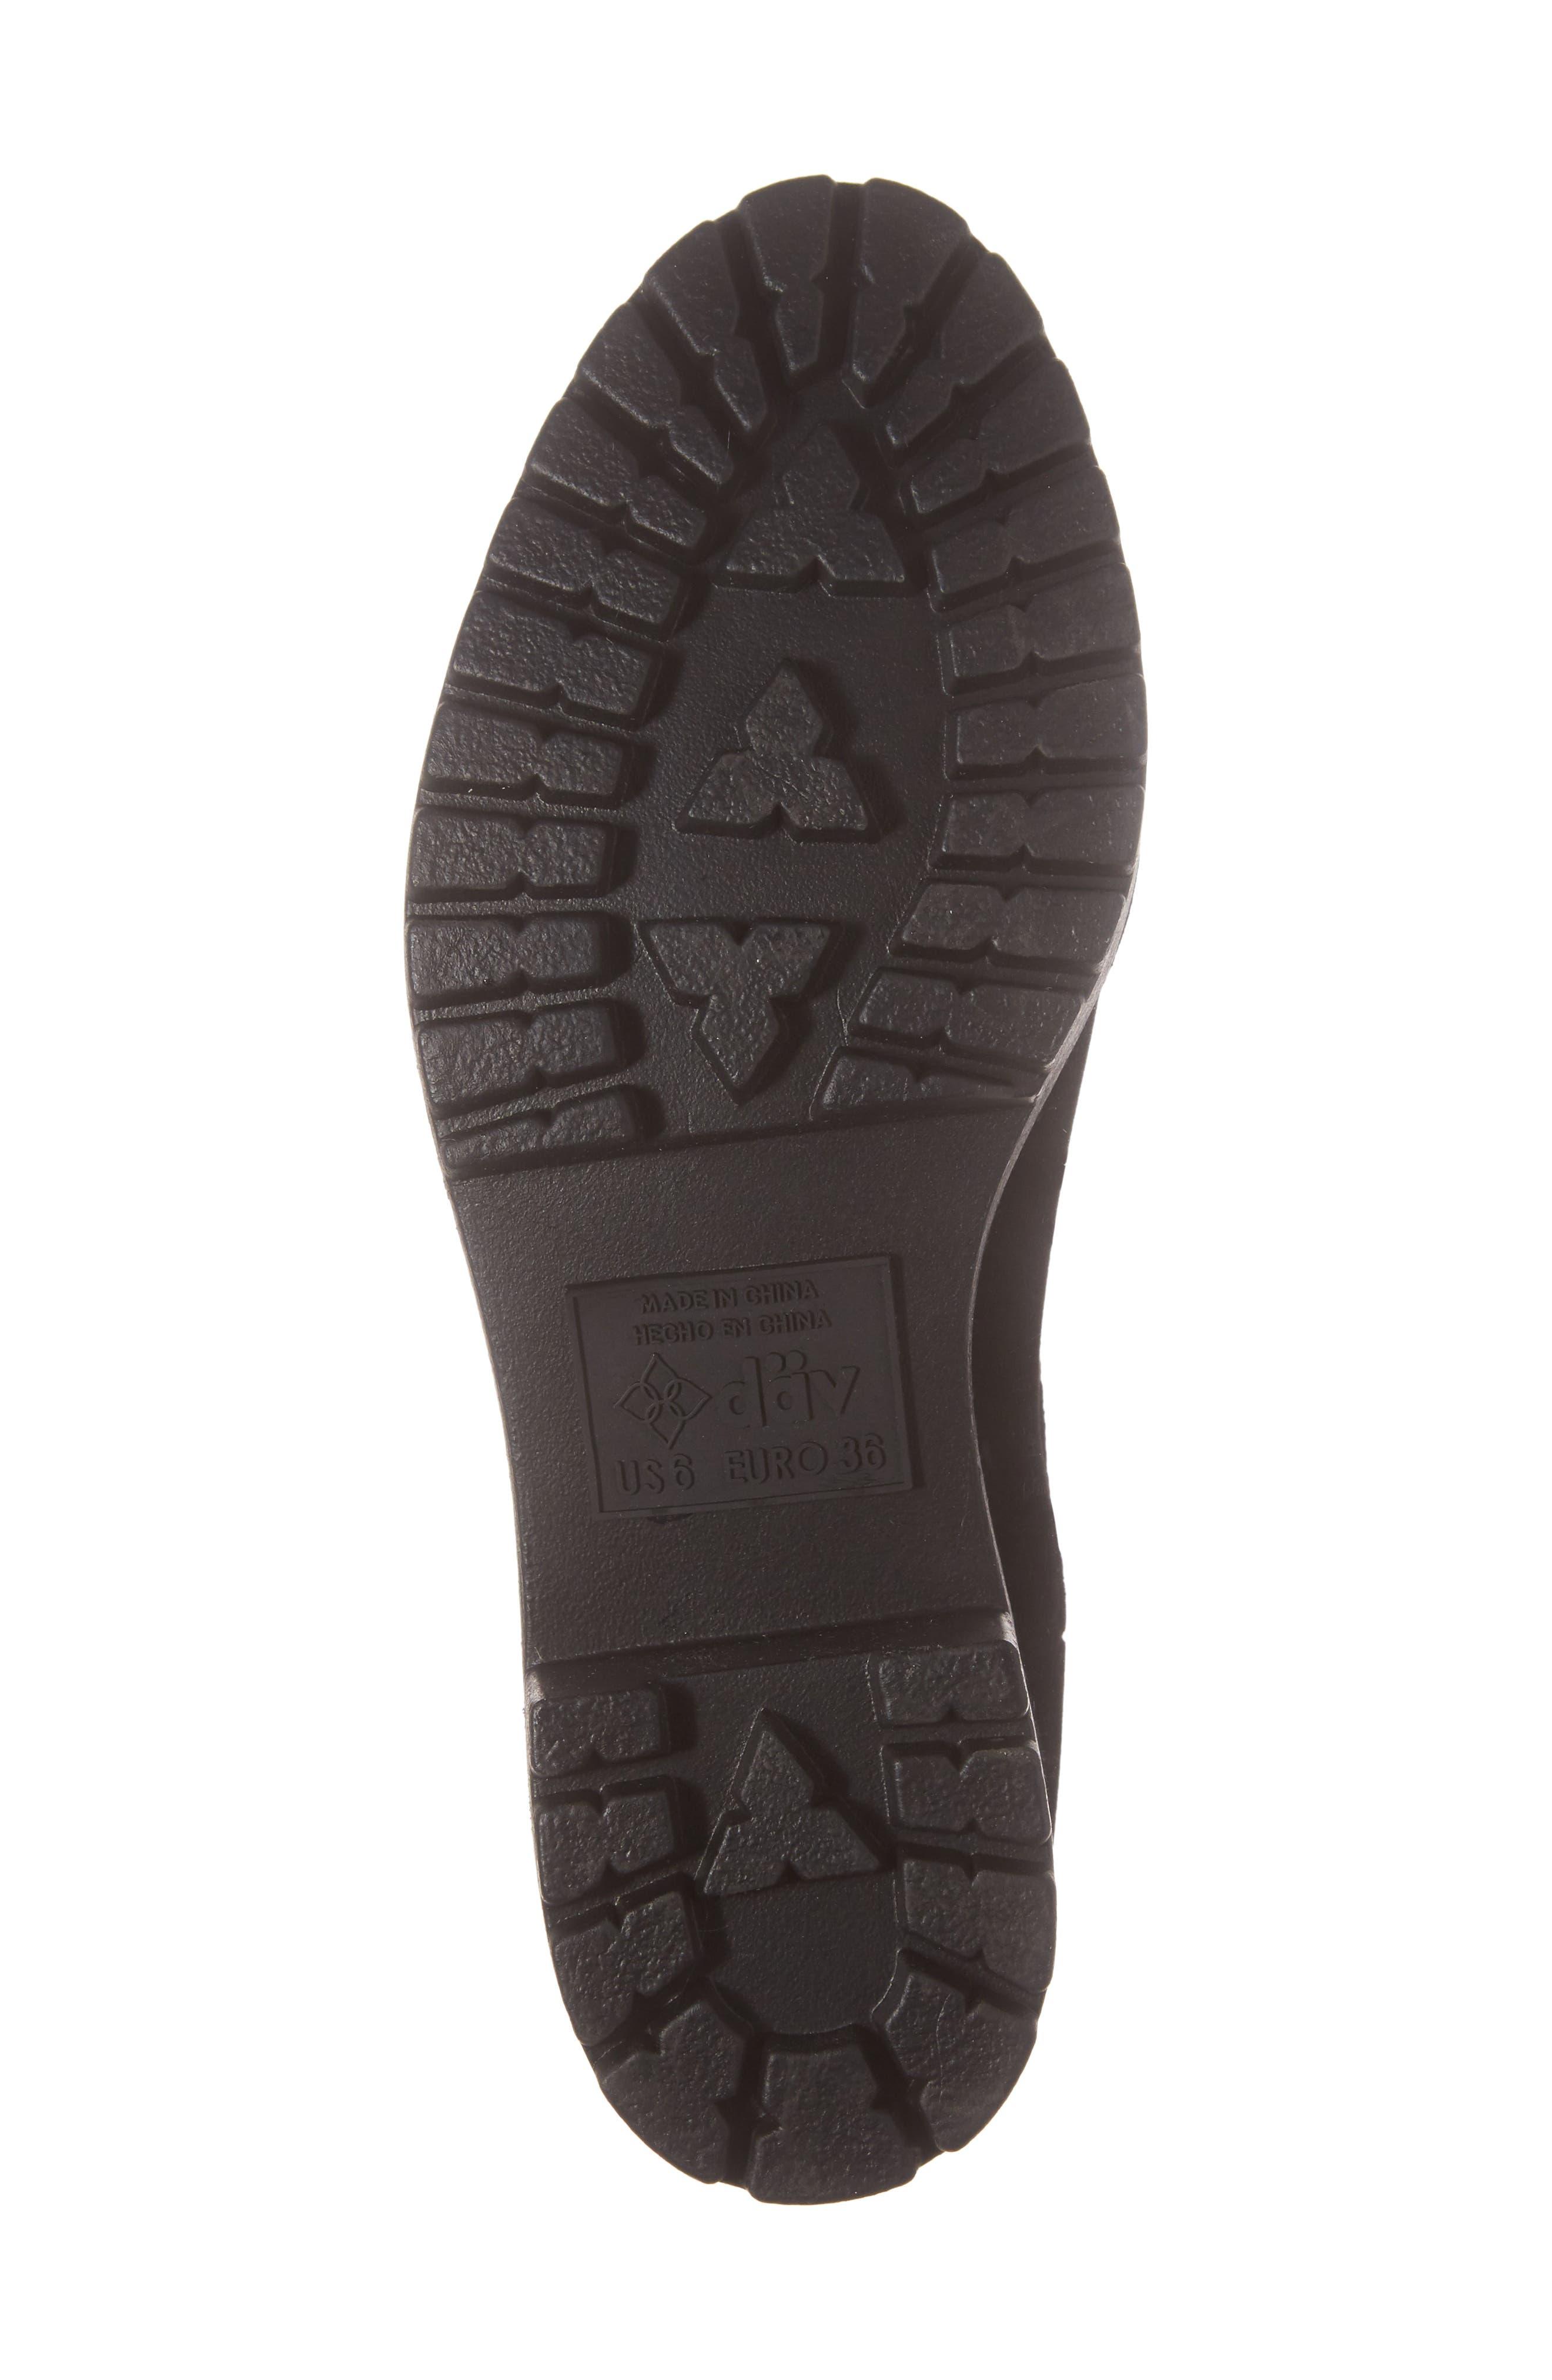 Leeds Lace-Up Waterproof Boot,                             Alternate thumbnail 6, color,                             BLACK